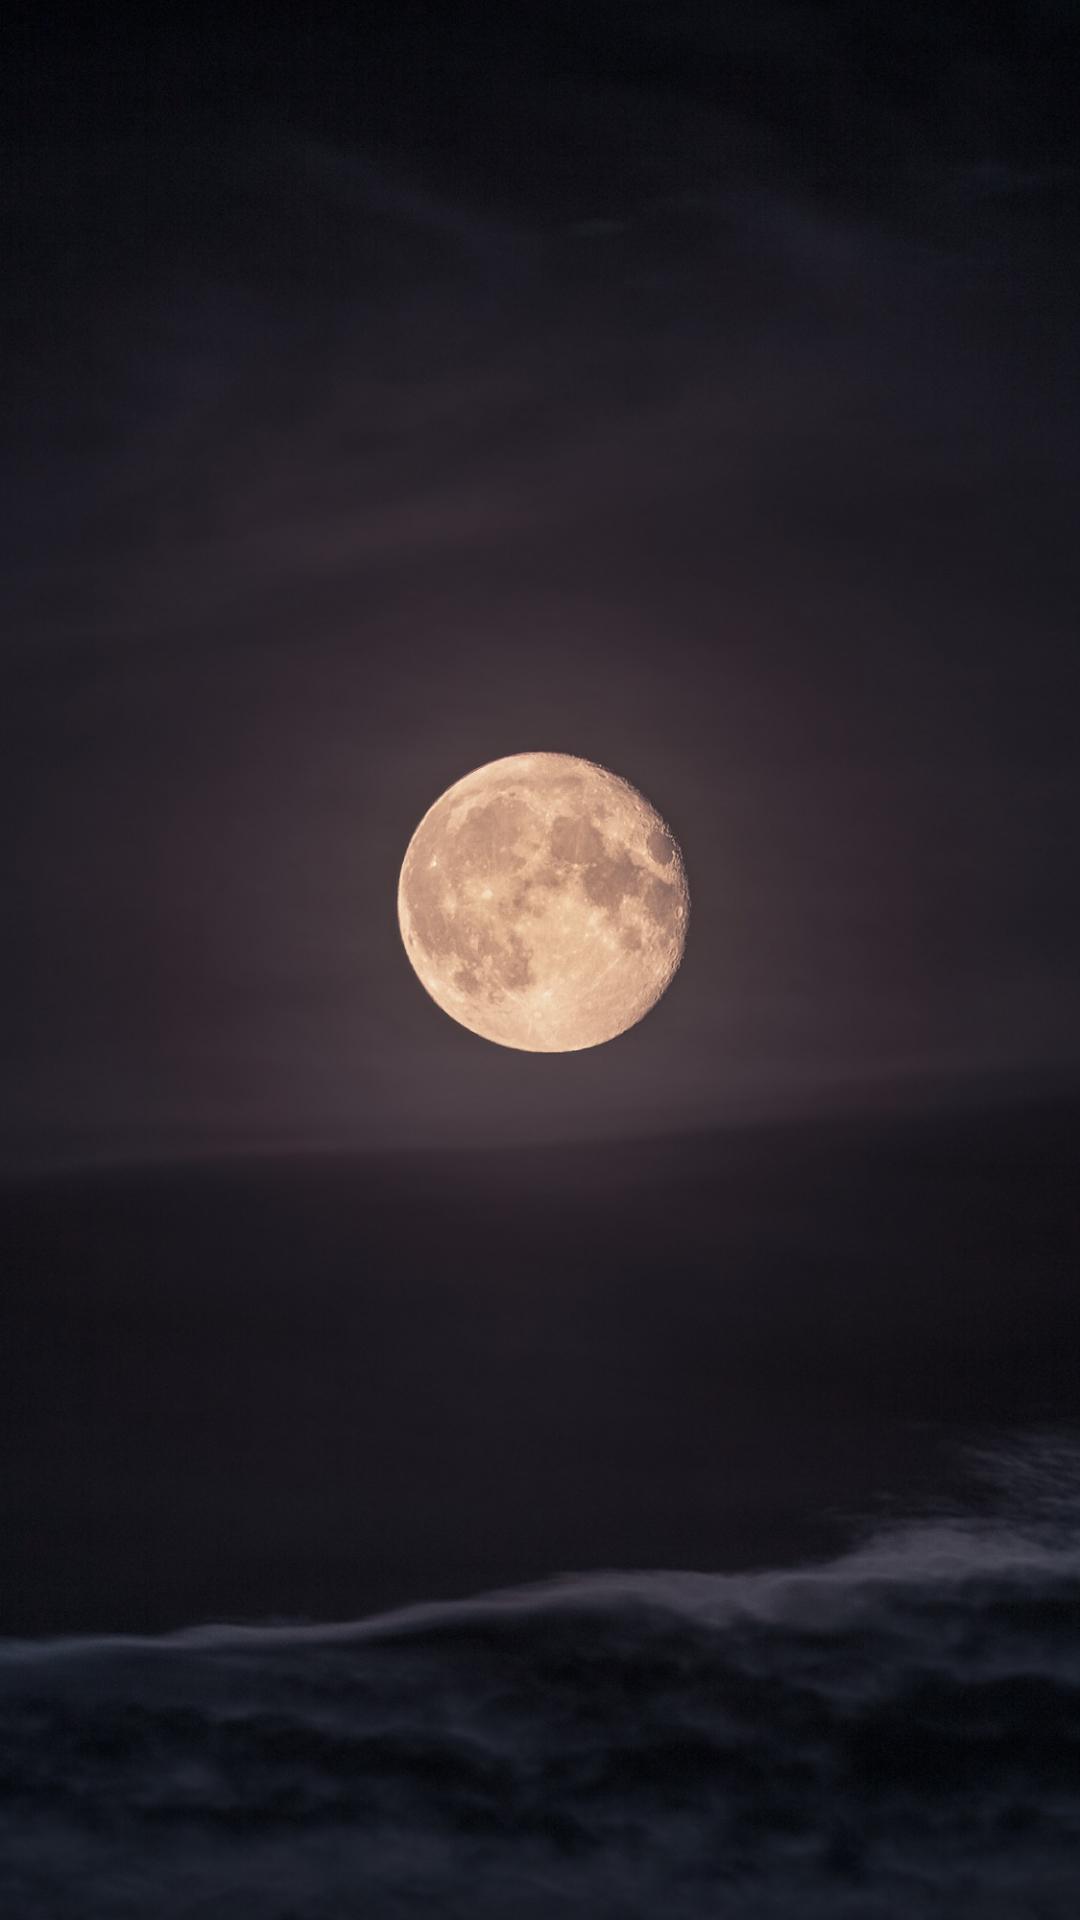 Moon, Full Moon iPhone Wallpaper